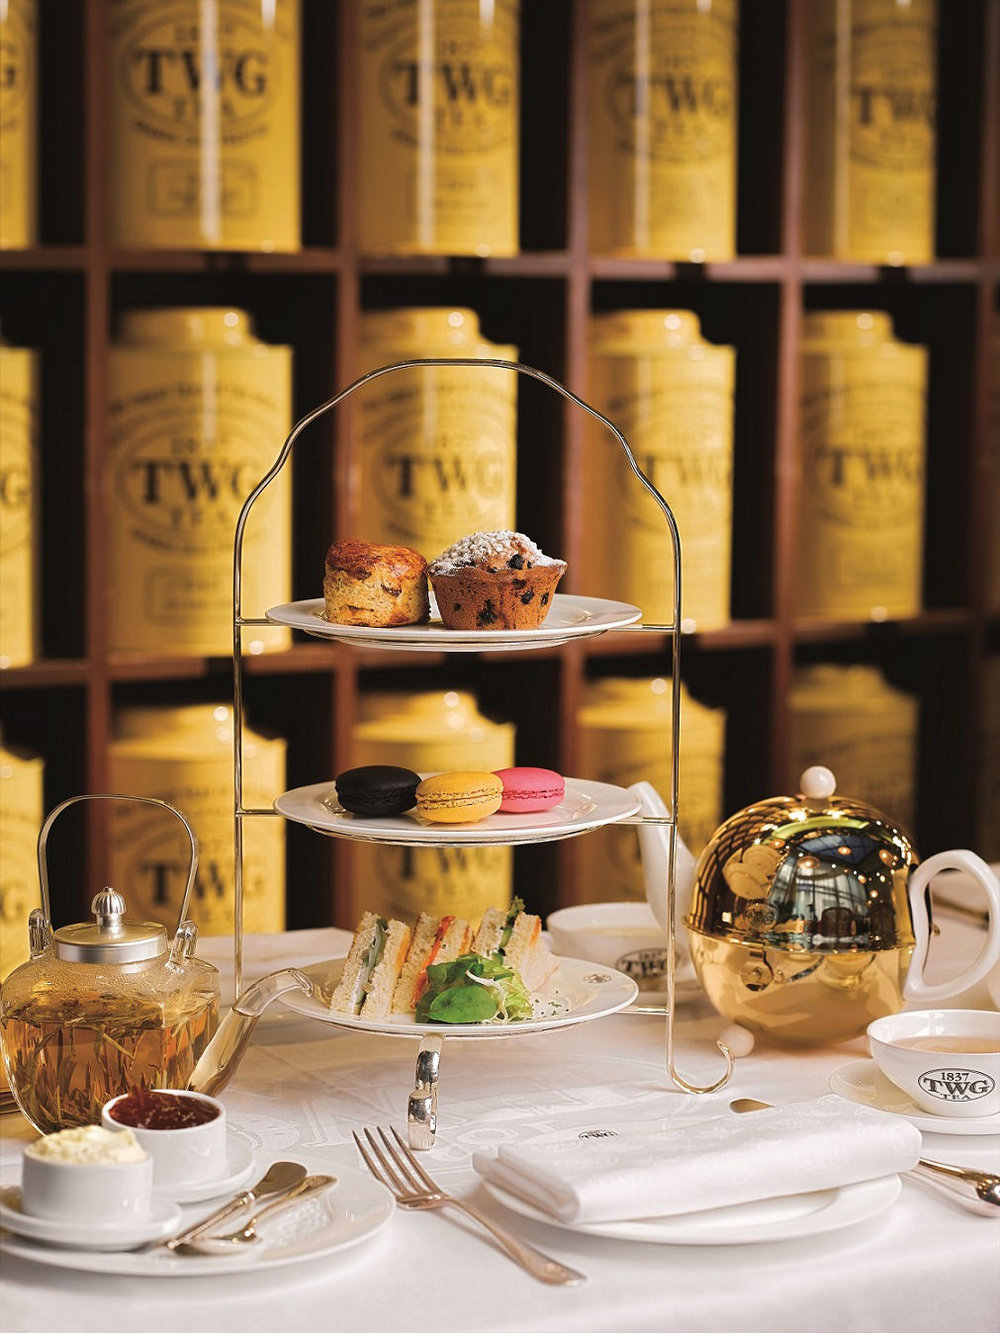 TWG Afternoon Tea Set.jpg